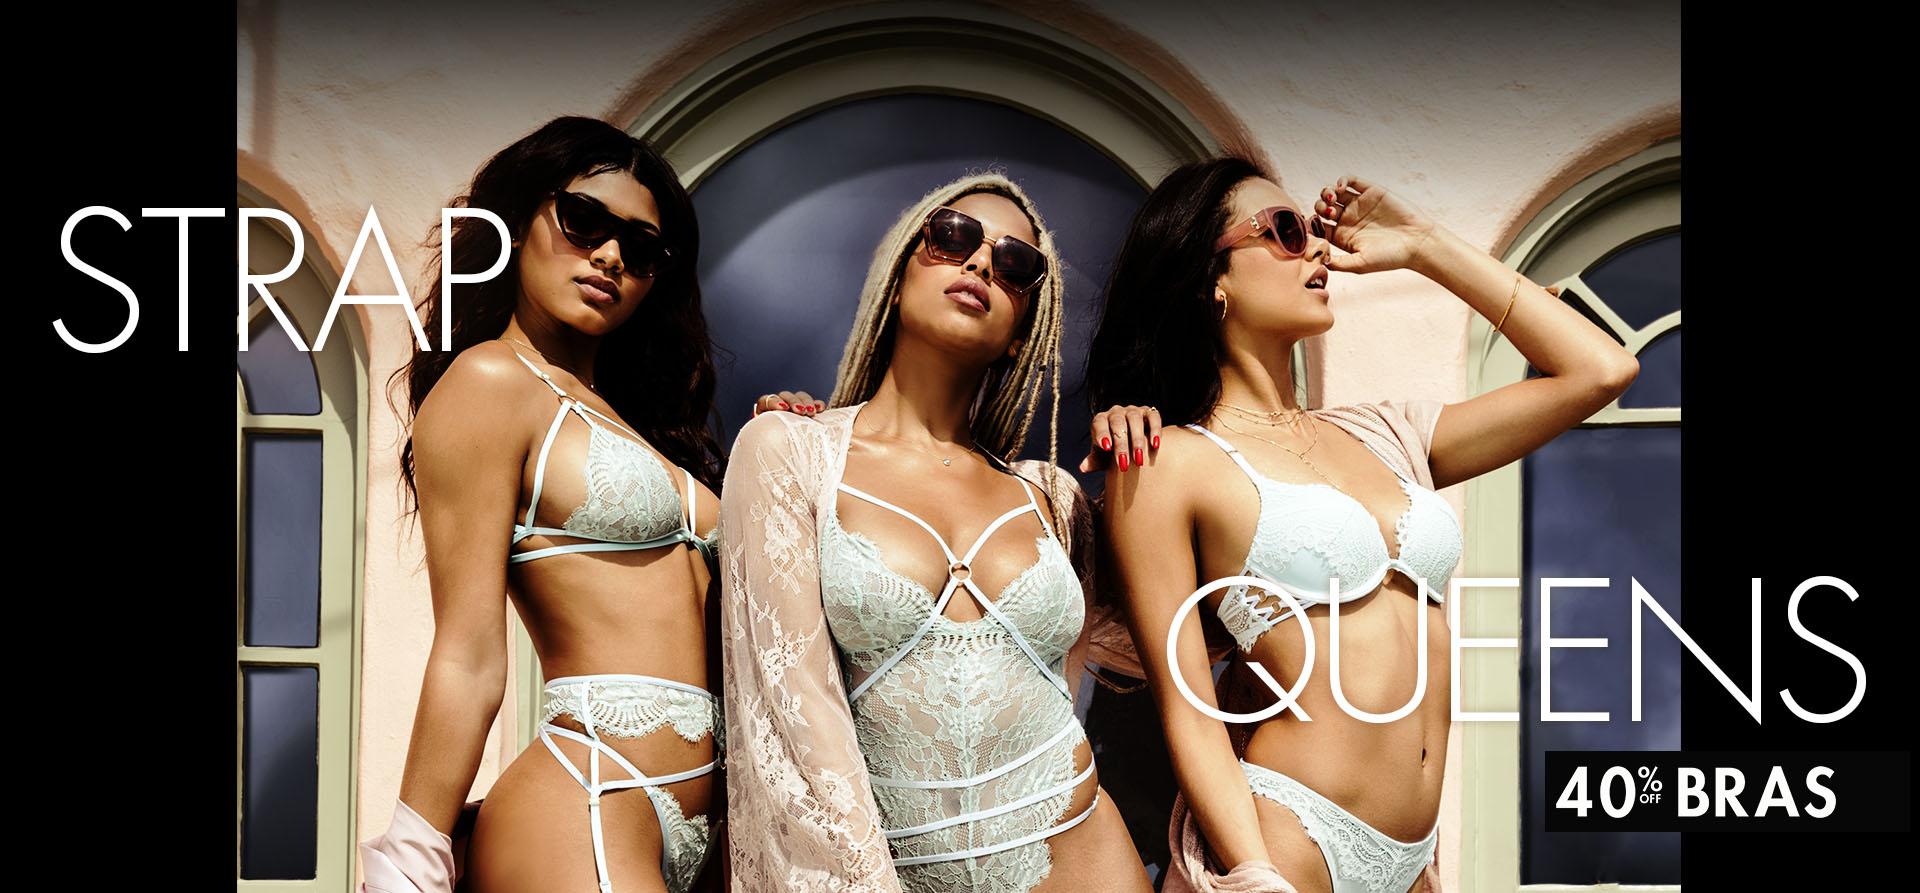 651491ccf Strap queens. 40% off bras. Shop now